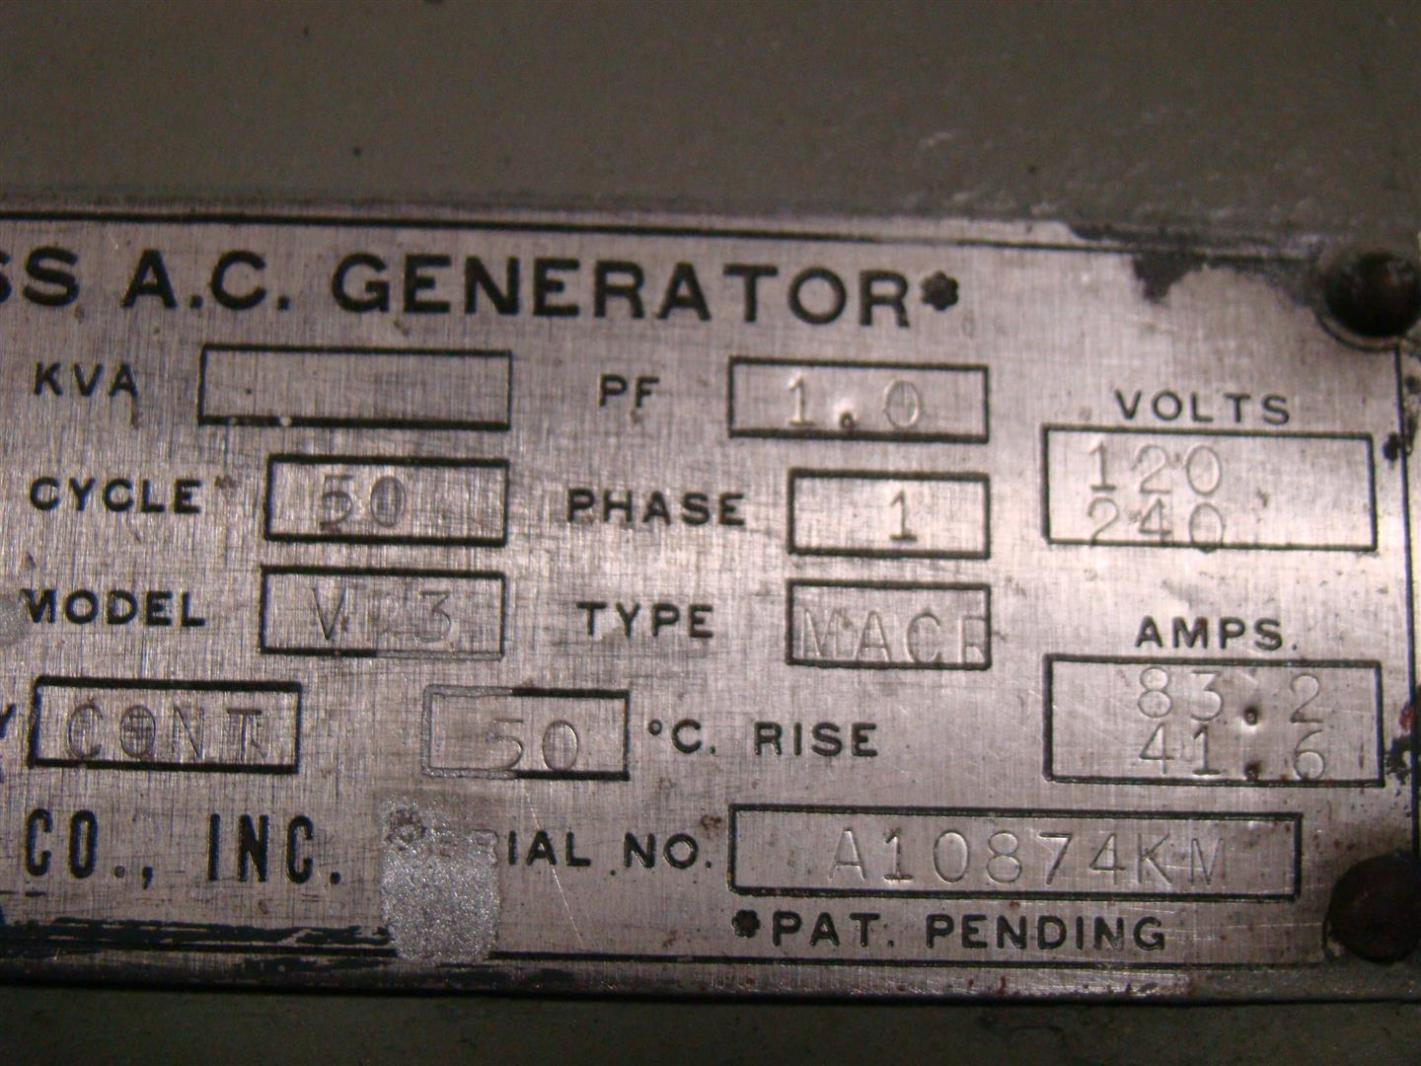 lima generator wiring diagram lima image wiring condec lima brushless ac generator 10kw 1500rpm ph1 120 240volts on lima generator wiring diagram